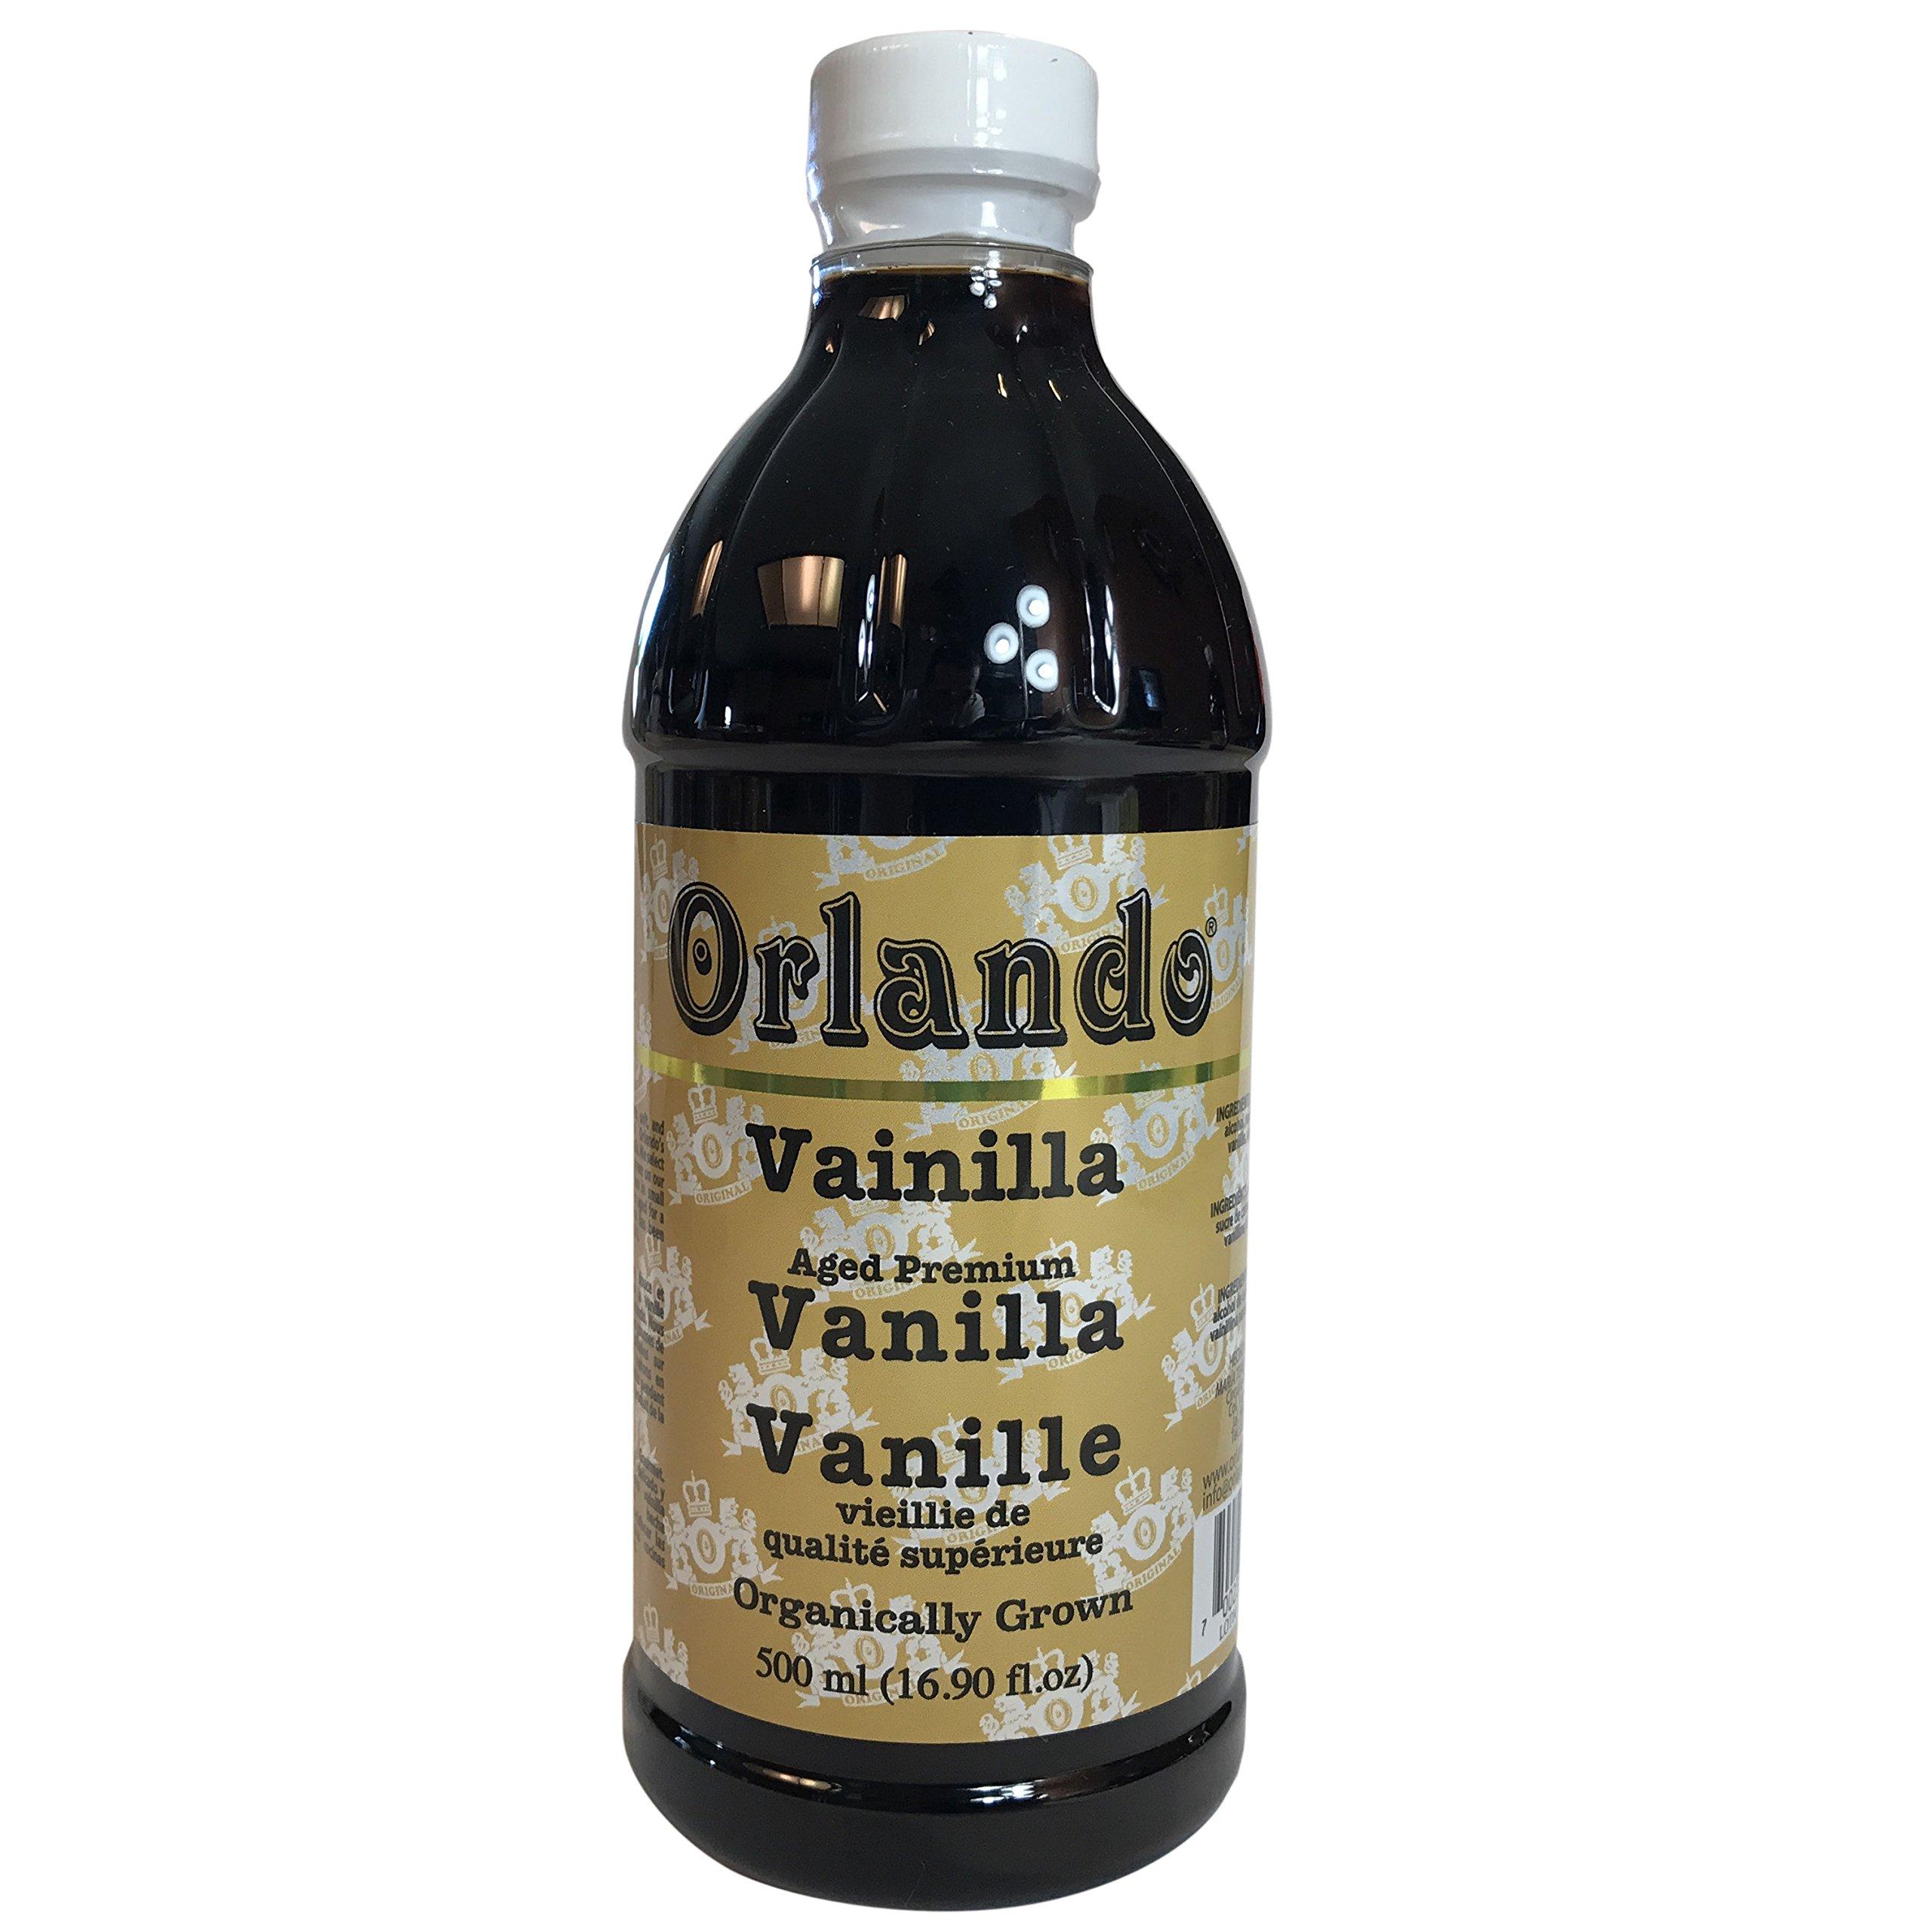 Premium Gourmet Mexican Vanilla (Amber Colored) (16 Fl. Oz.) by Orlando